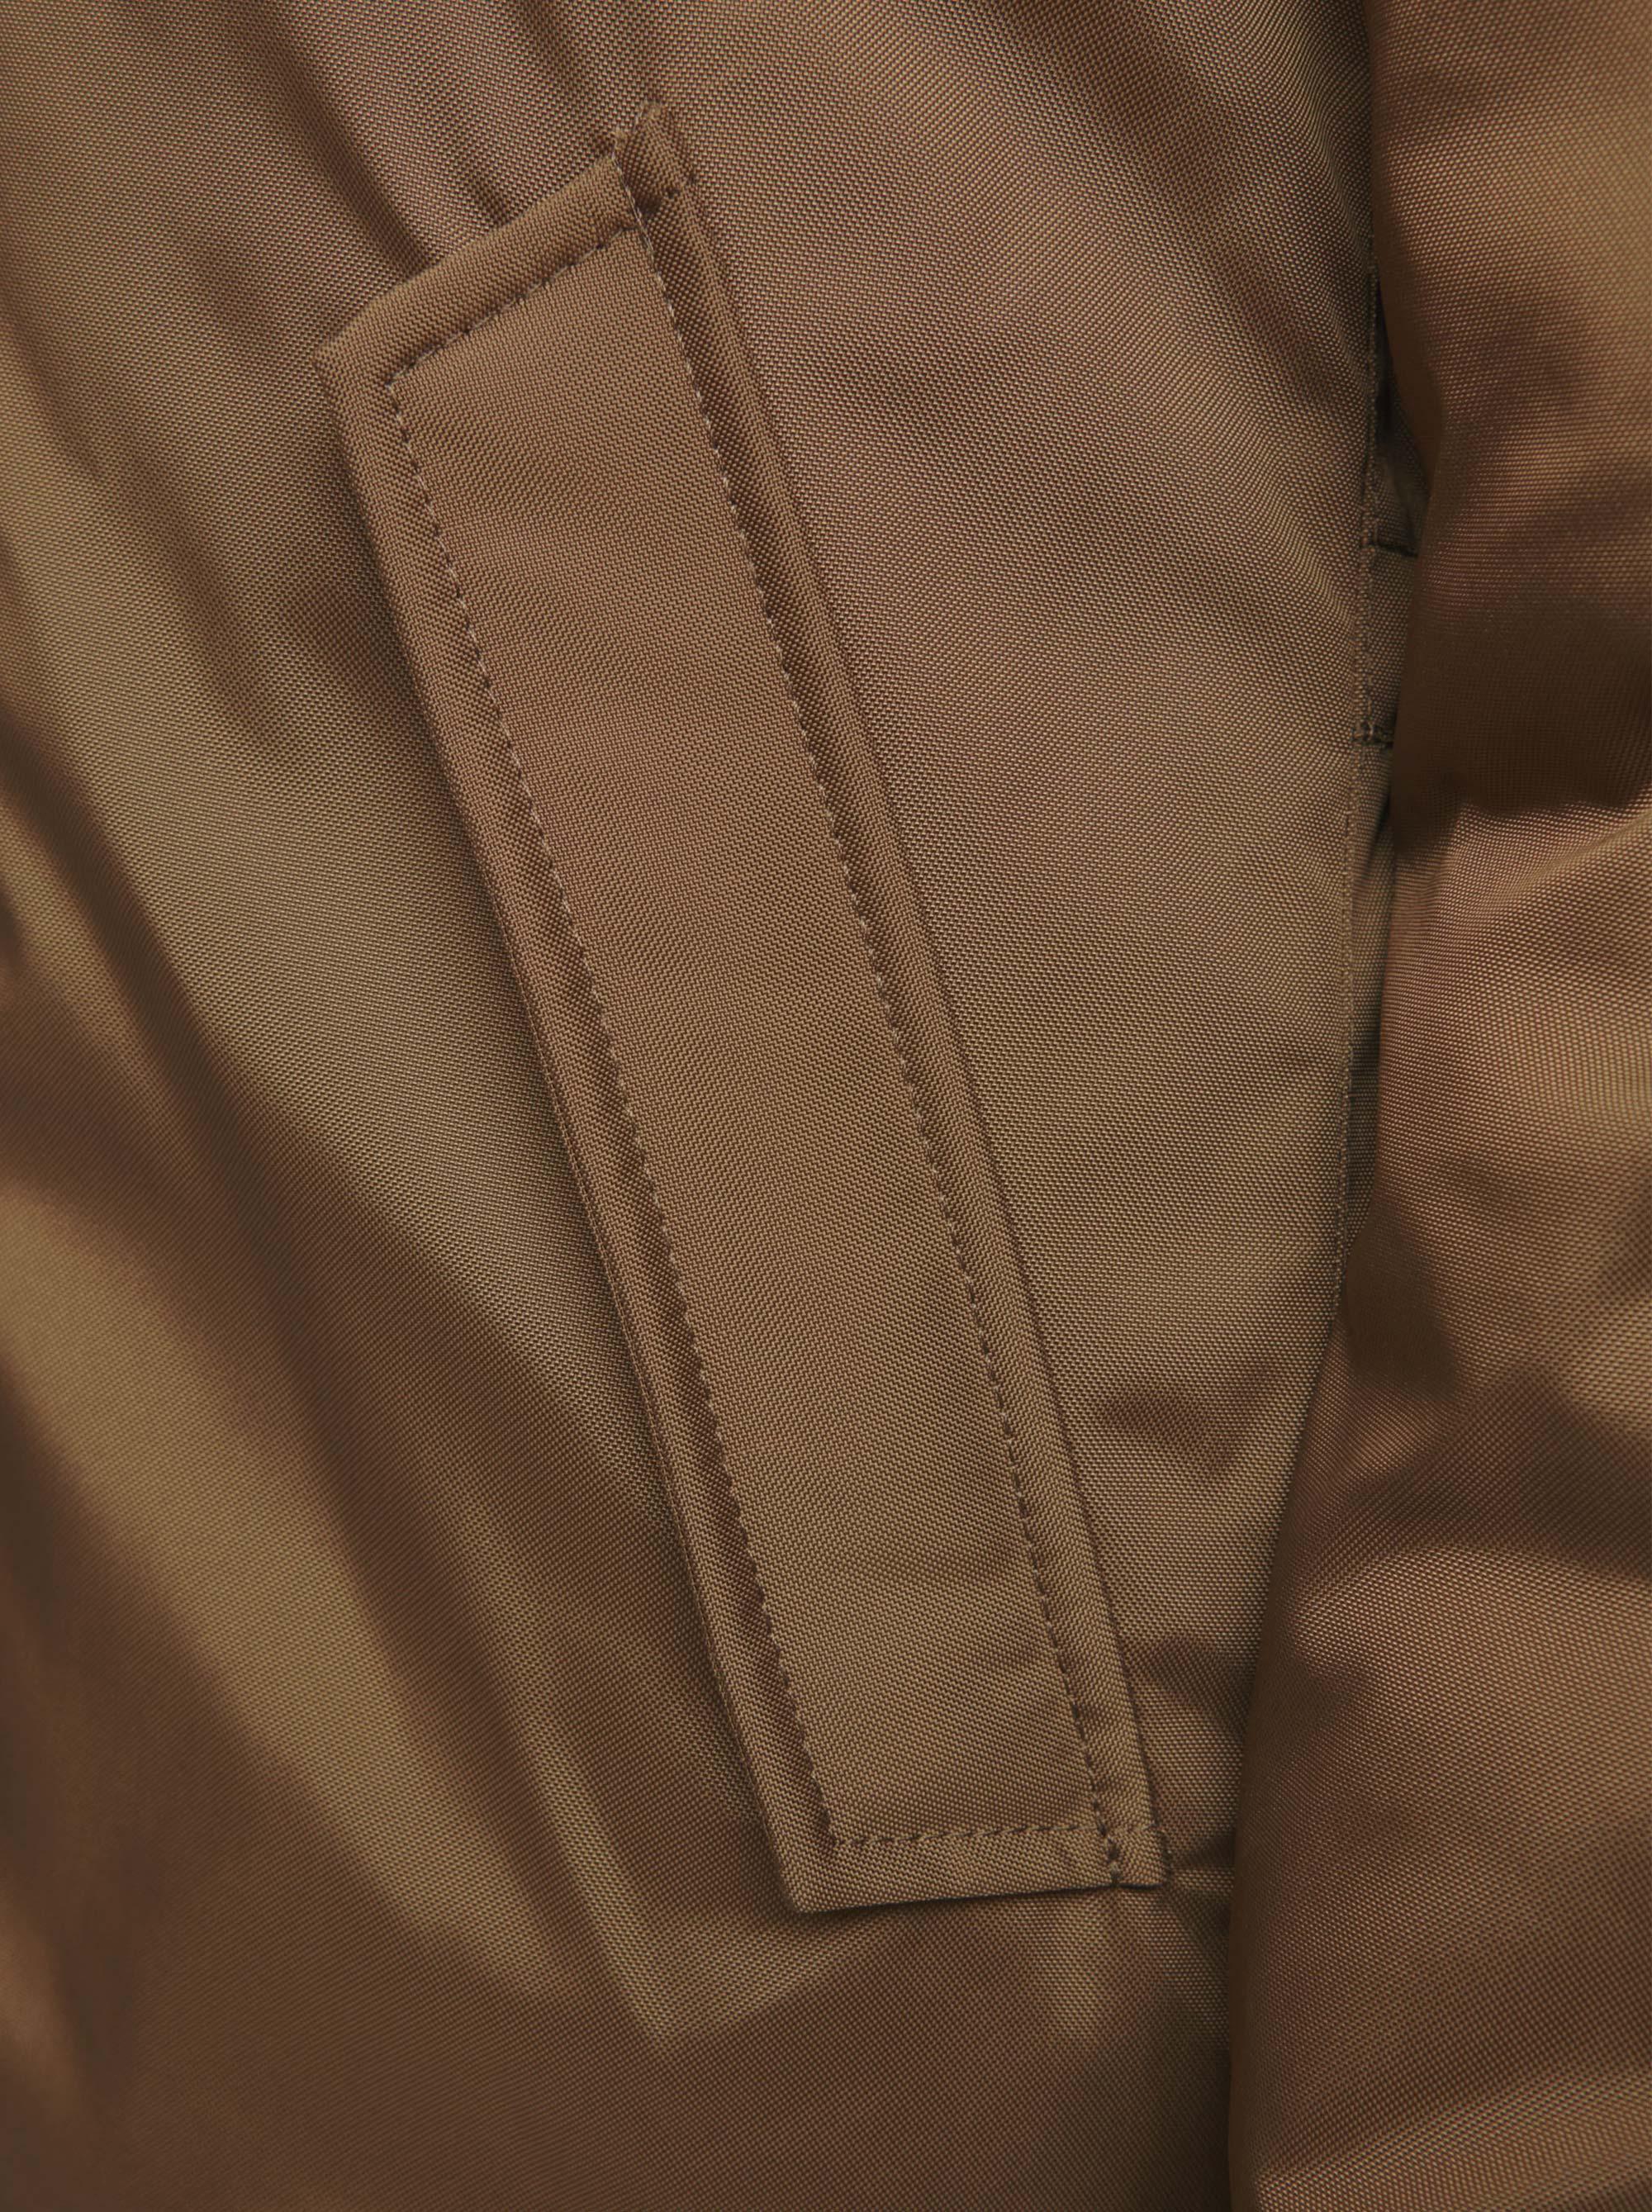 Teym - The Parka - Women - Brown - Detail - 4